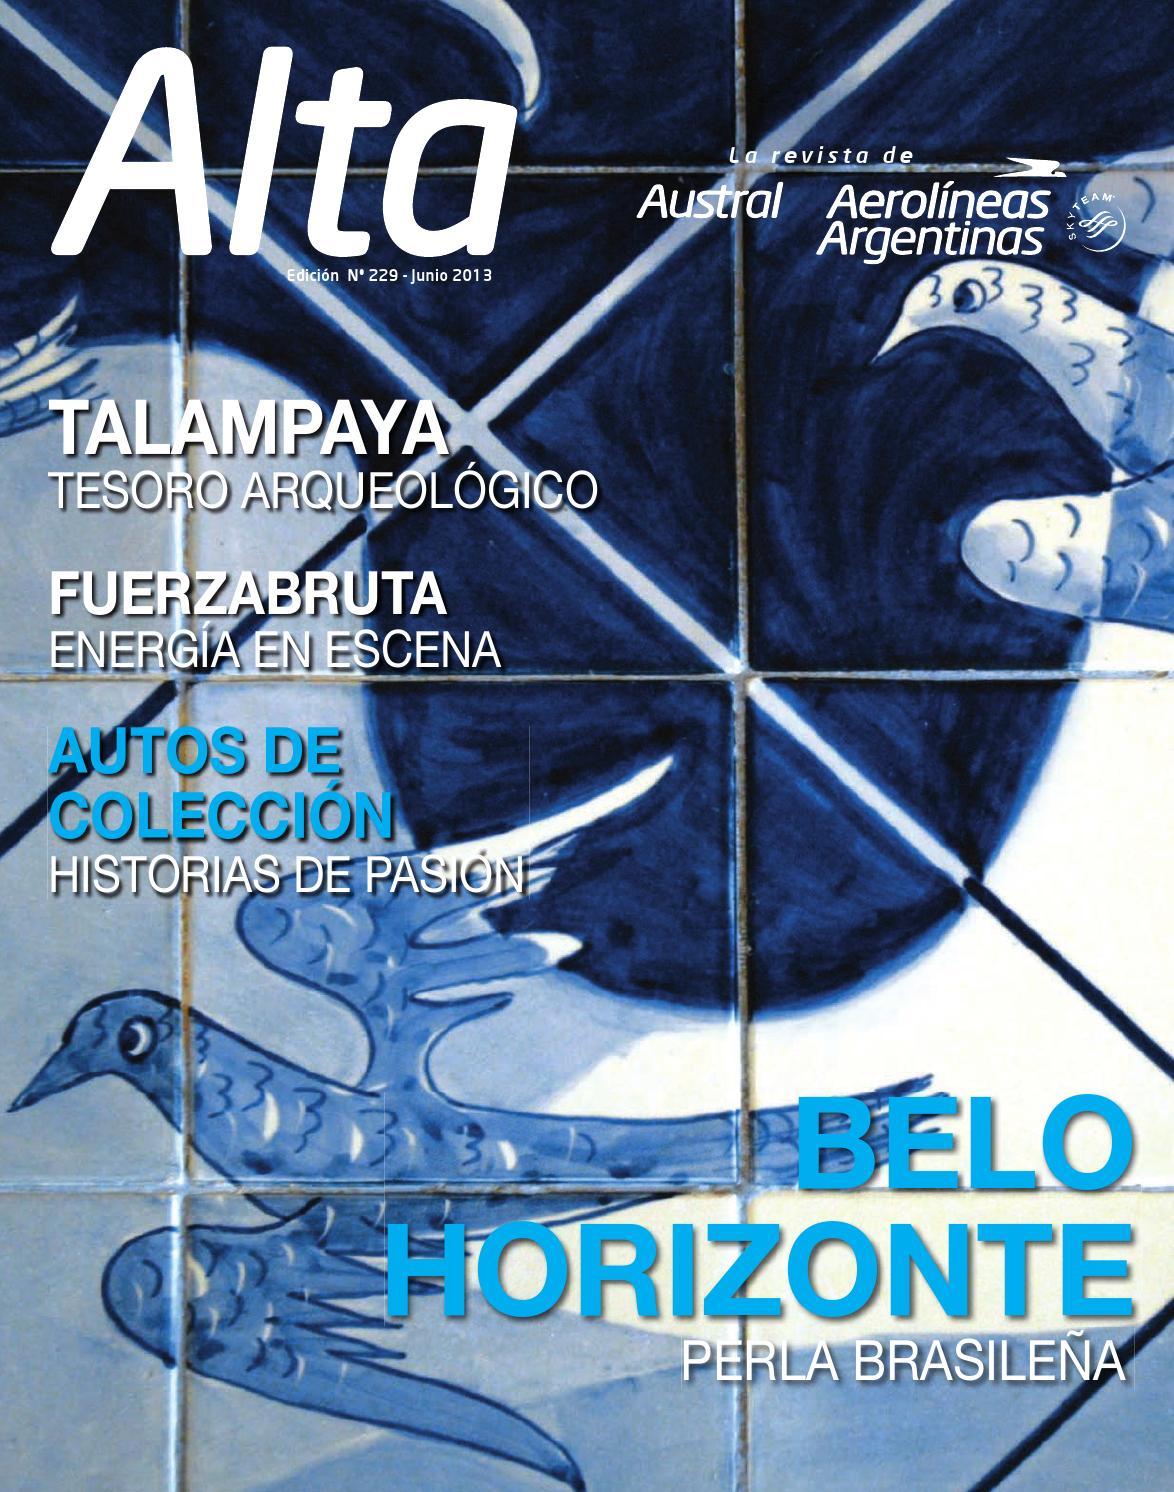 Alta Junio 2013 By Manzi Publishing Issuu Farfum Colon Garuda Airpot 100ml